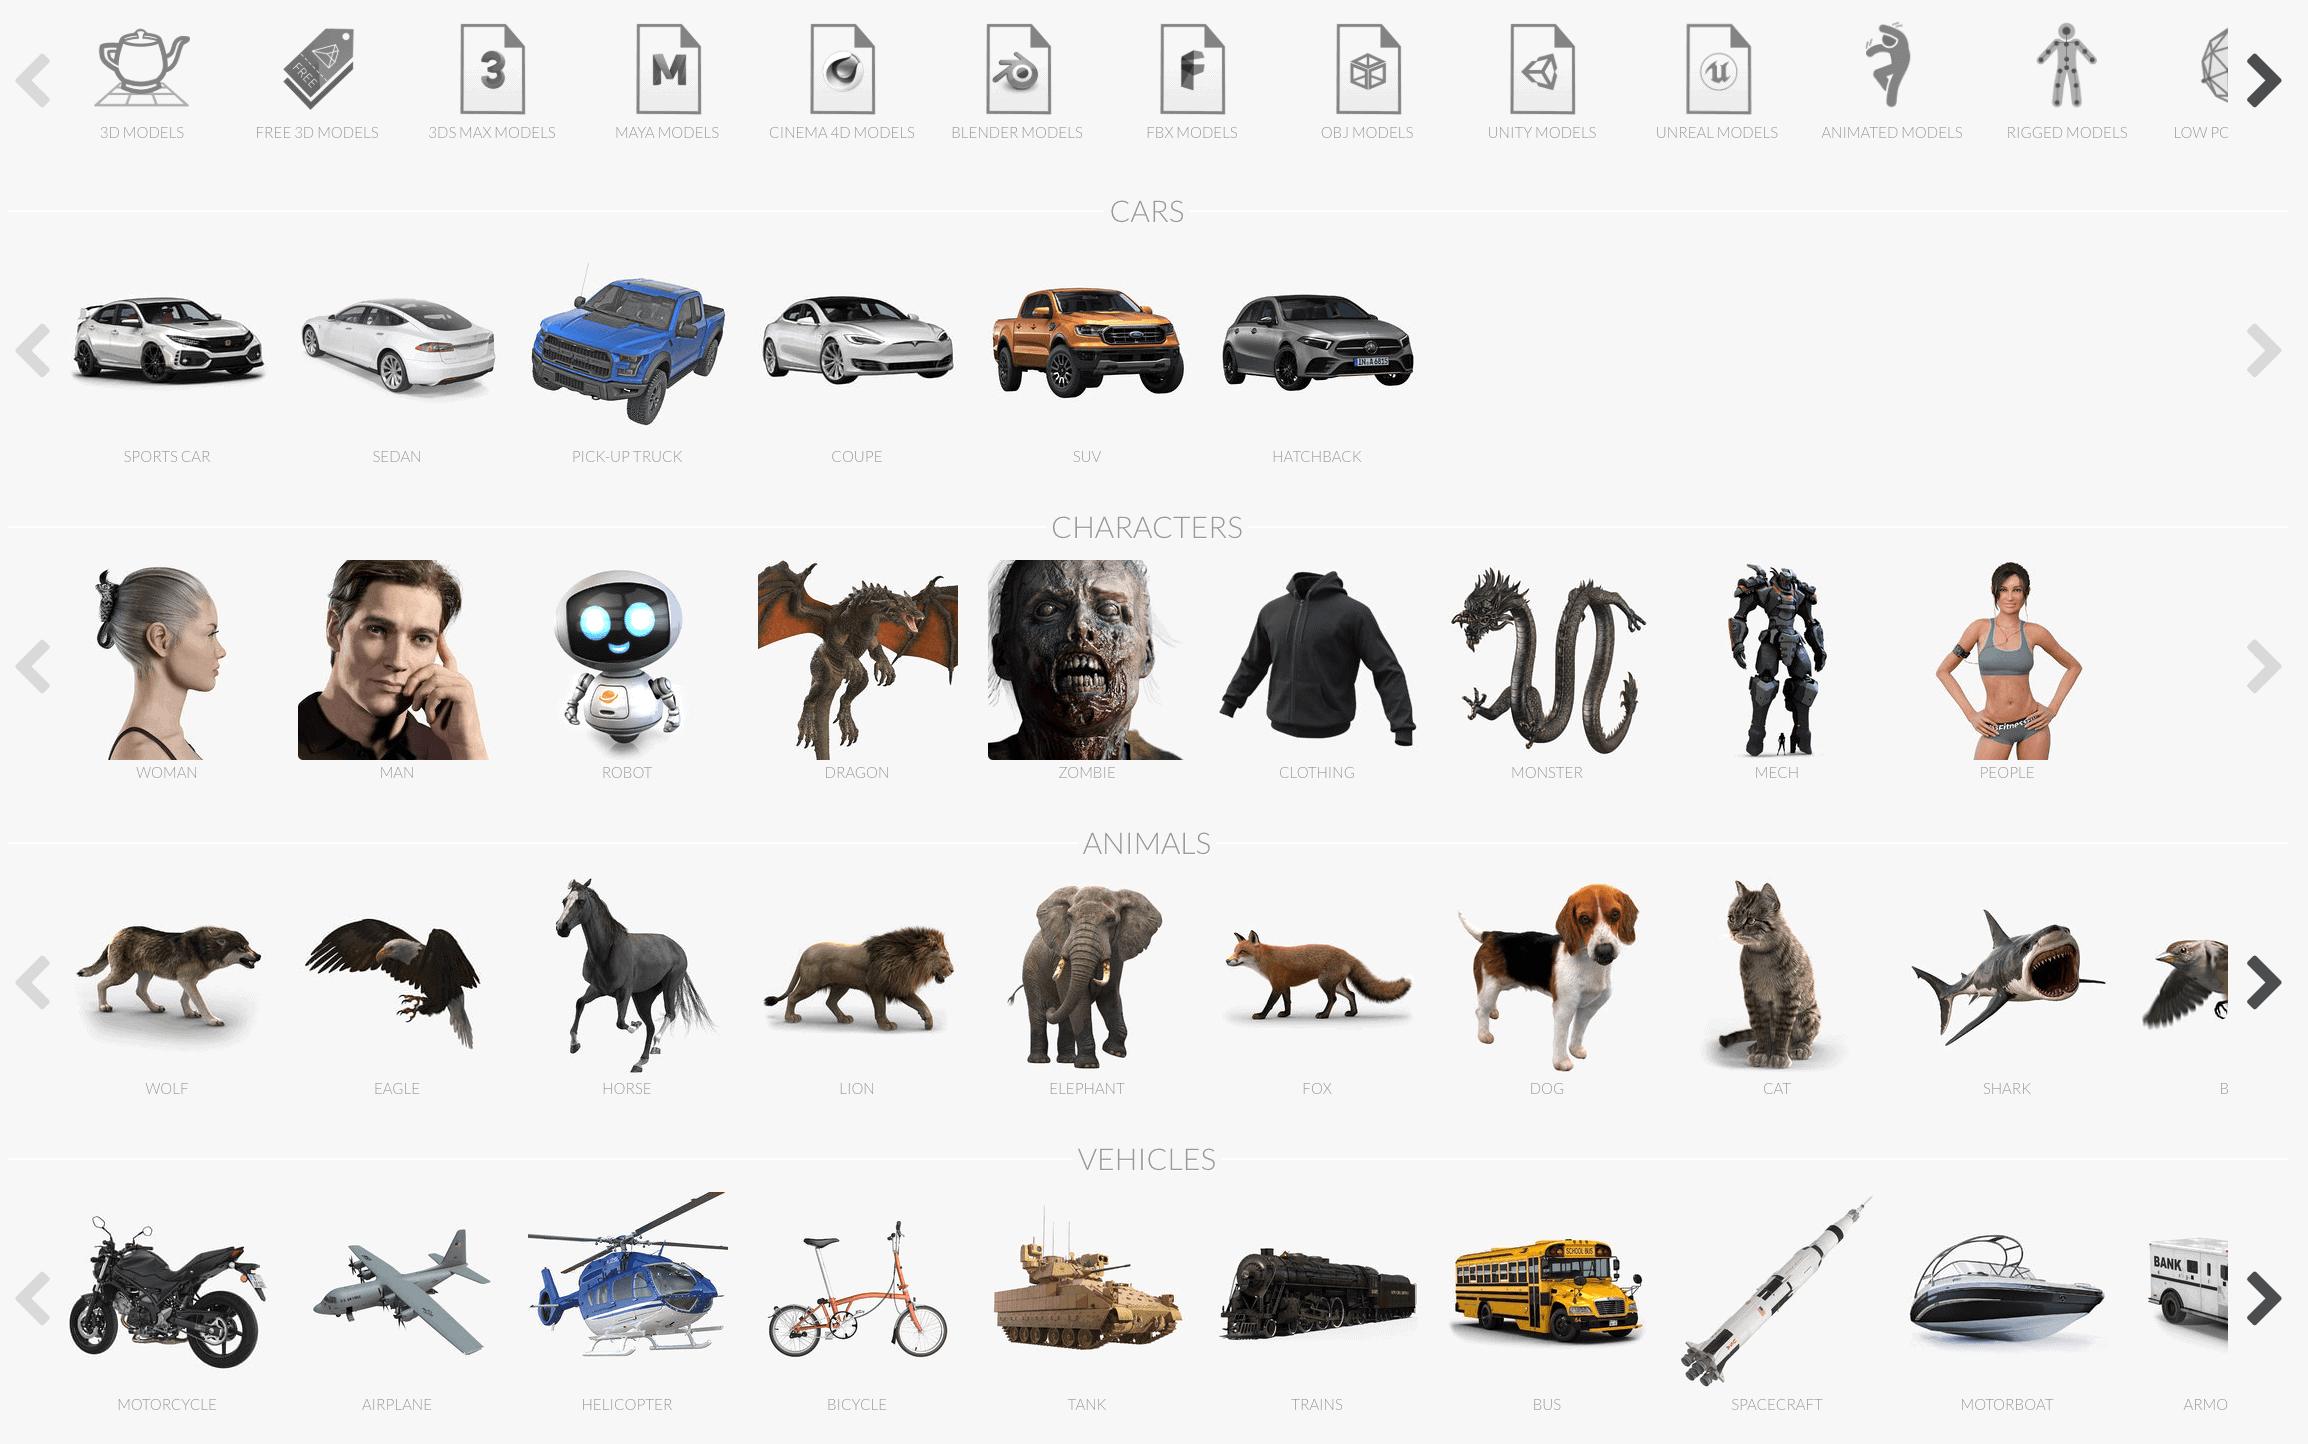 Download 3D Models for Professionals free